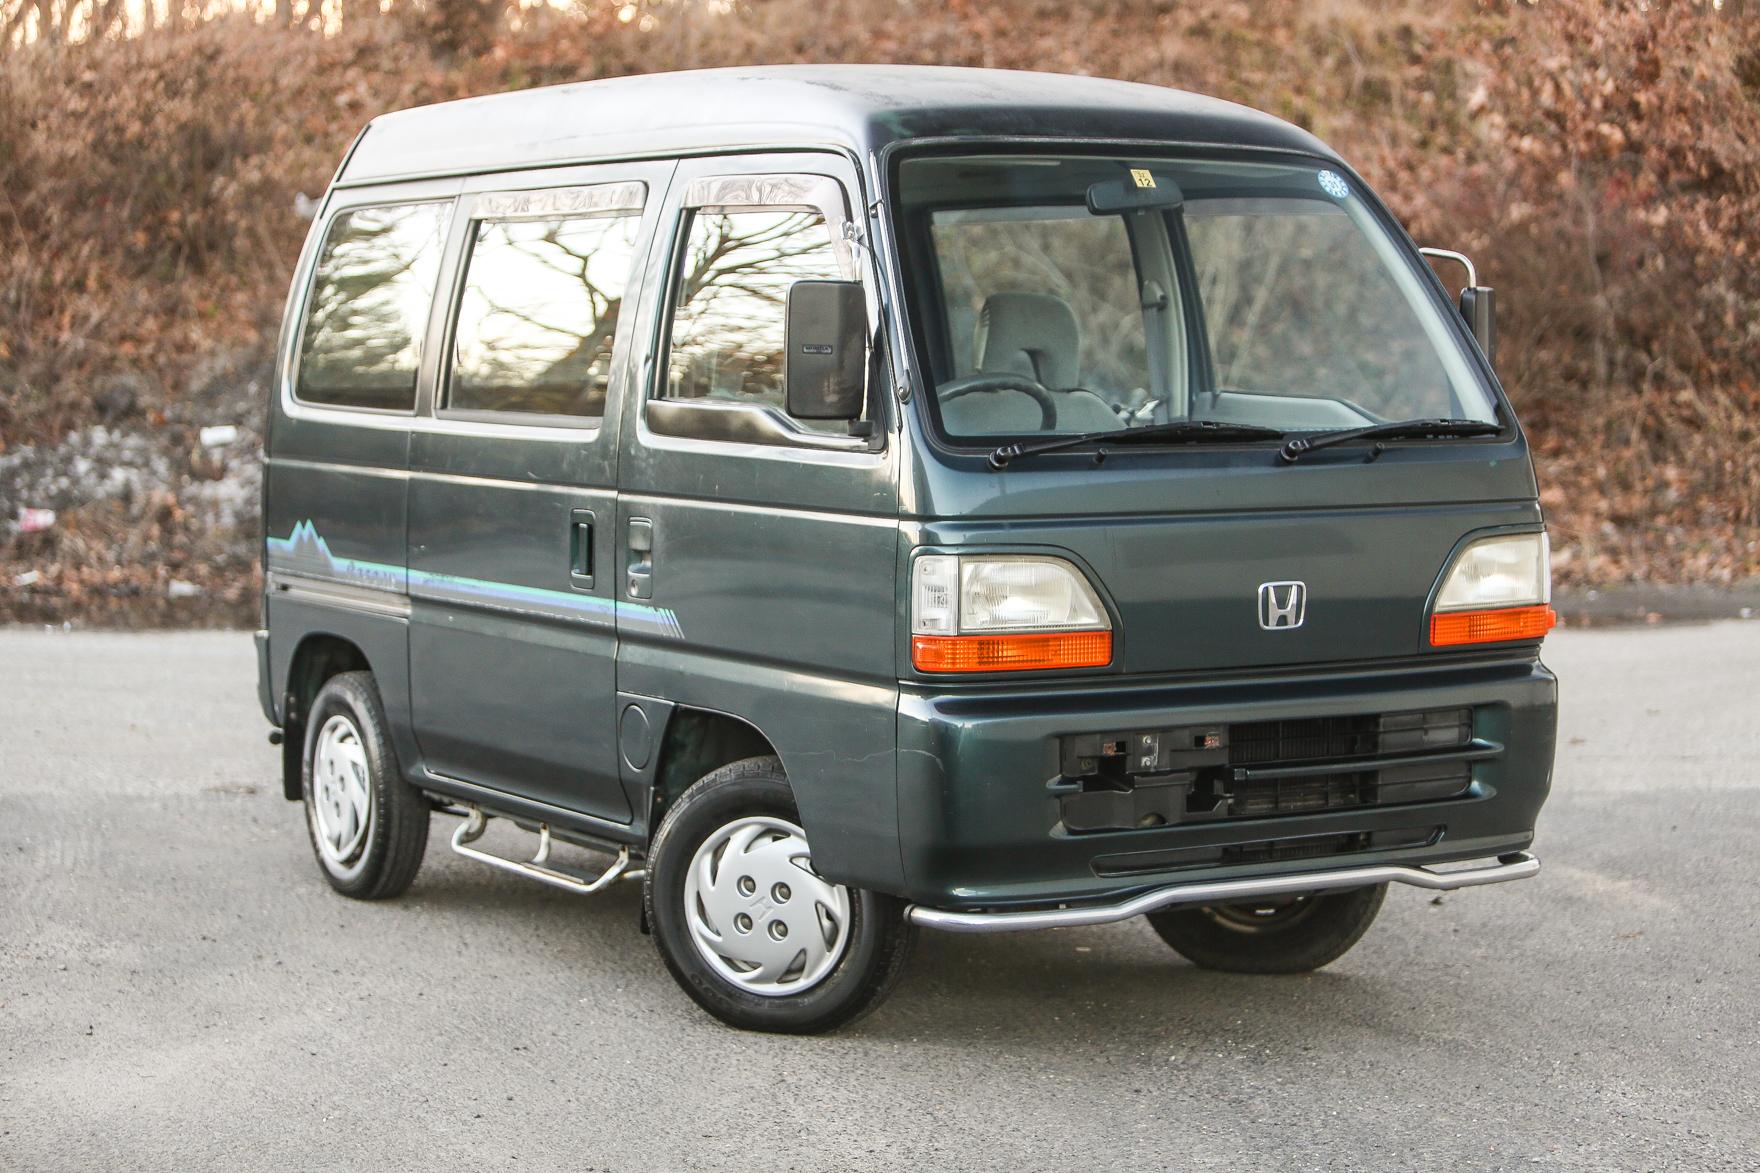 1994 Honda Street Van - $8,300